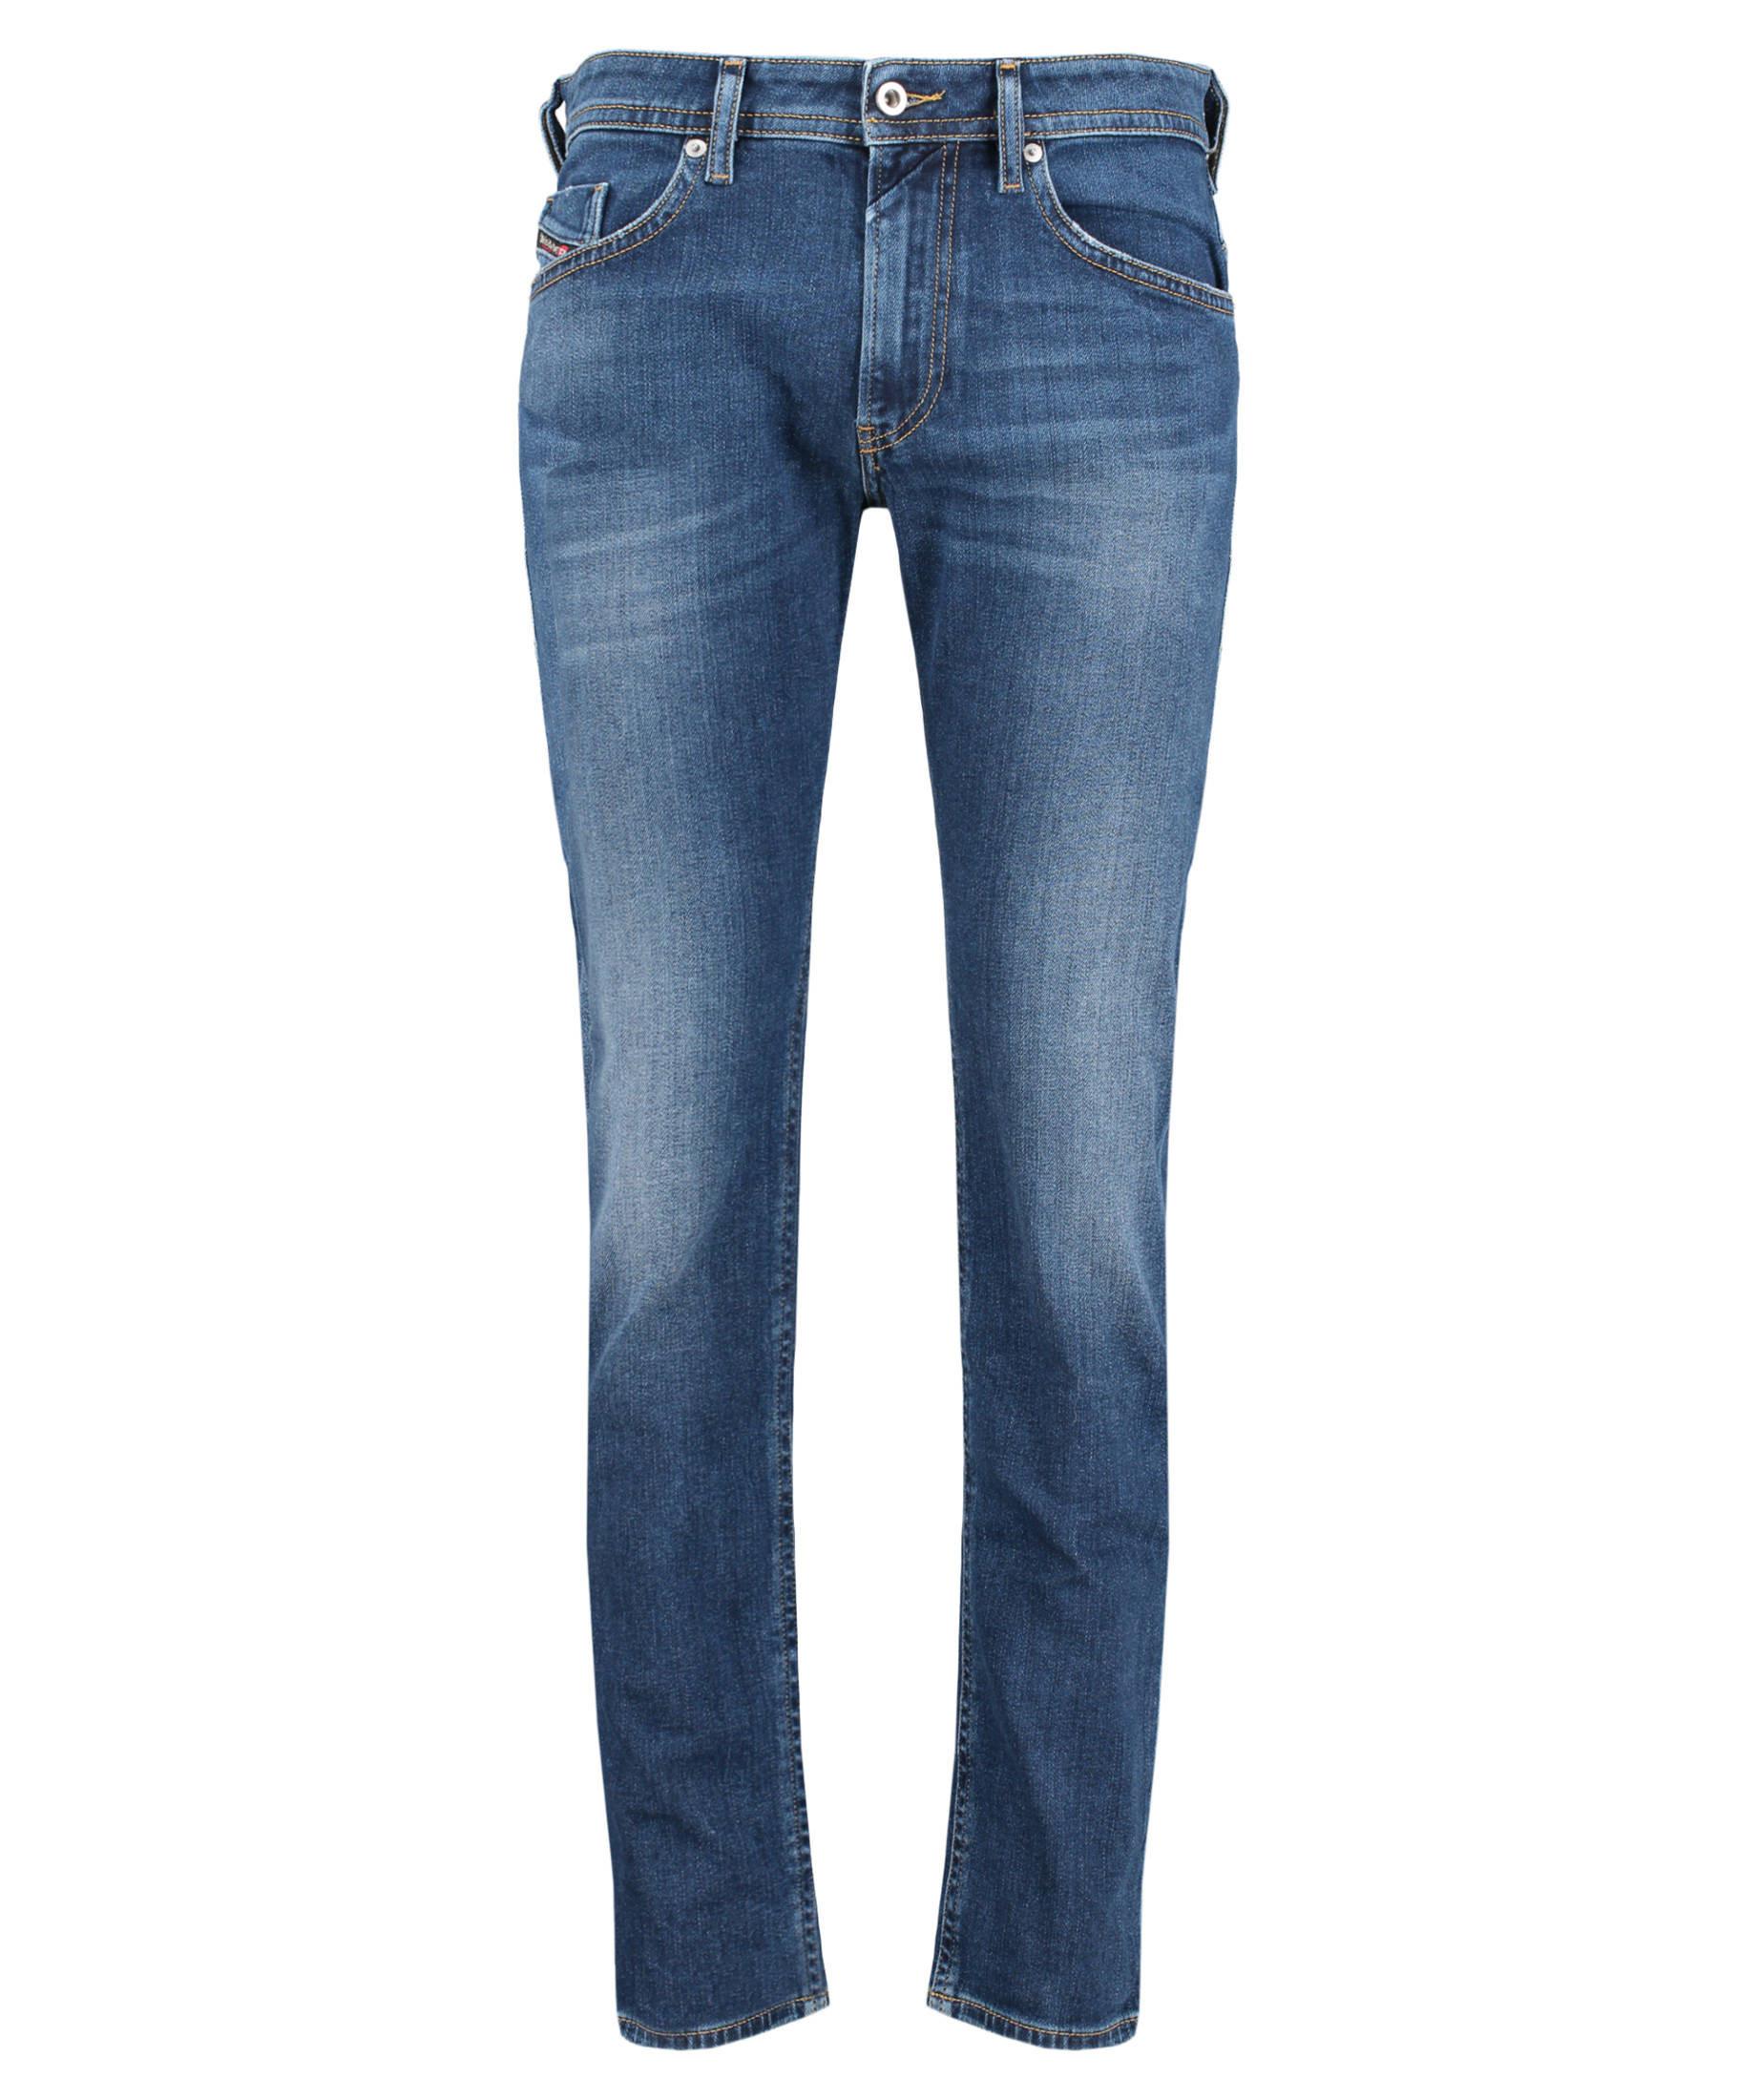 "Herren Jeans ""Thommer 0870F"" Slim Skinny Fit für 84,91€ statt 99,90€"